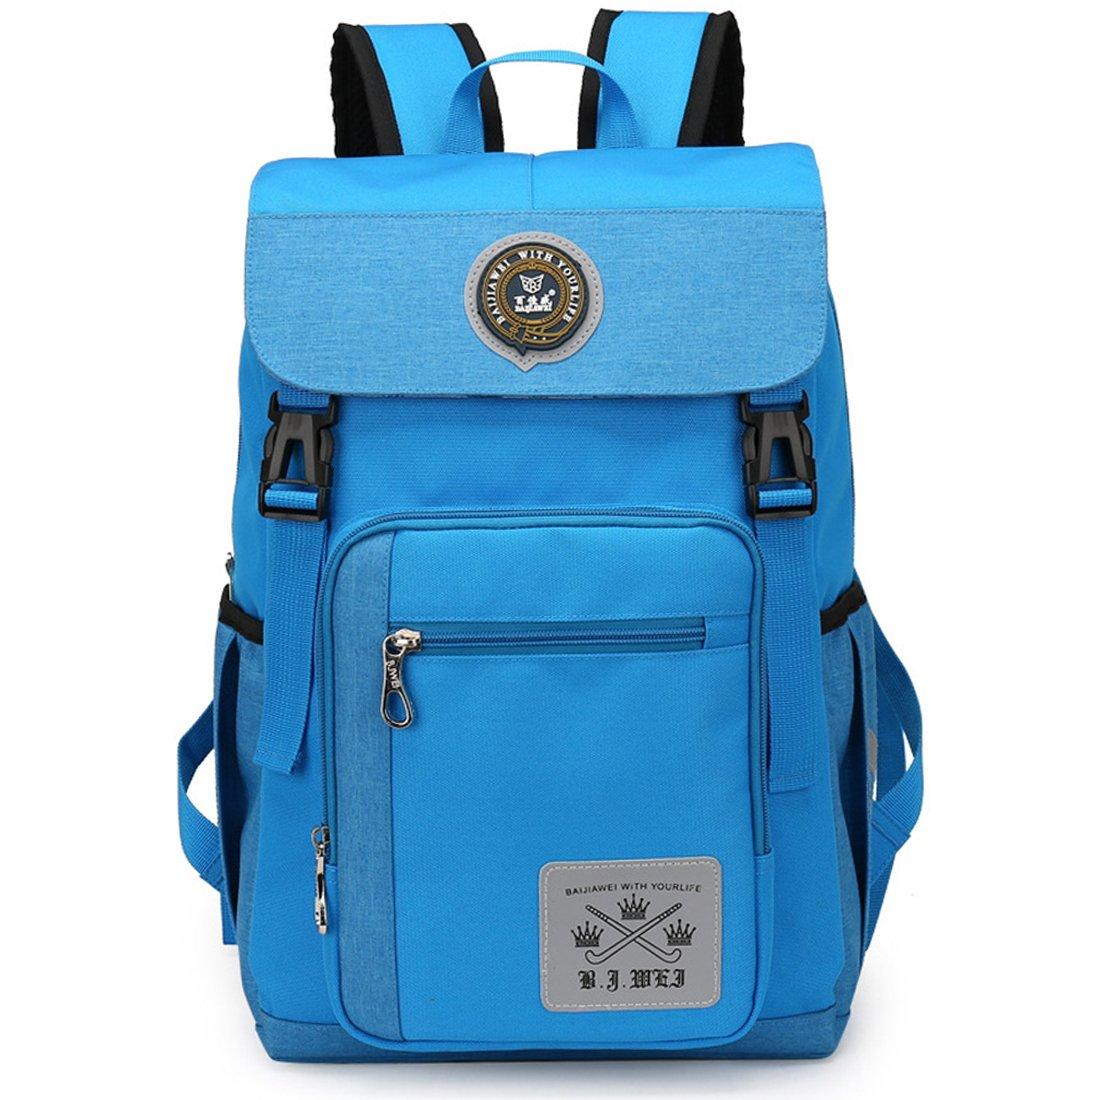 bce074c34b3b Ankoee Casual Vintage Backpack Hiking Backpack University Backpack ...